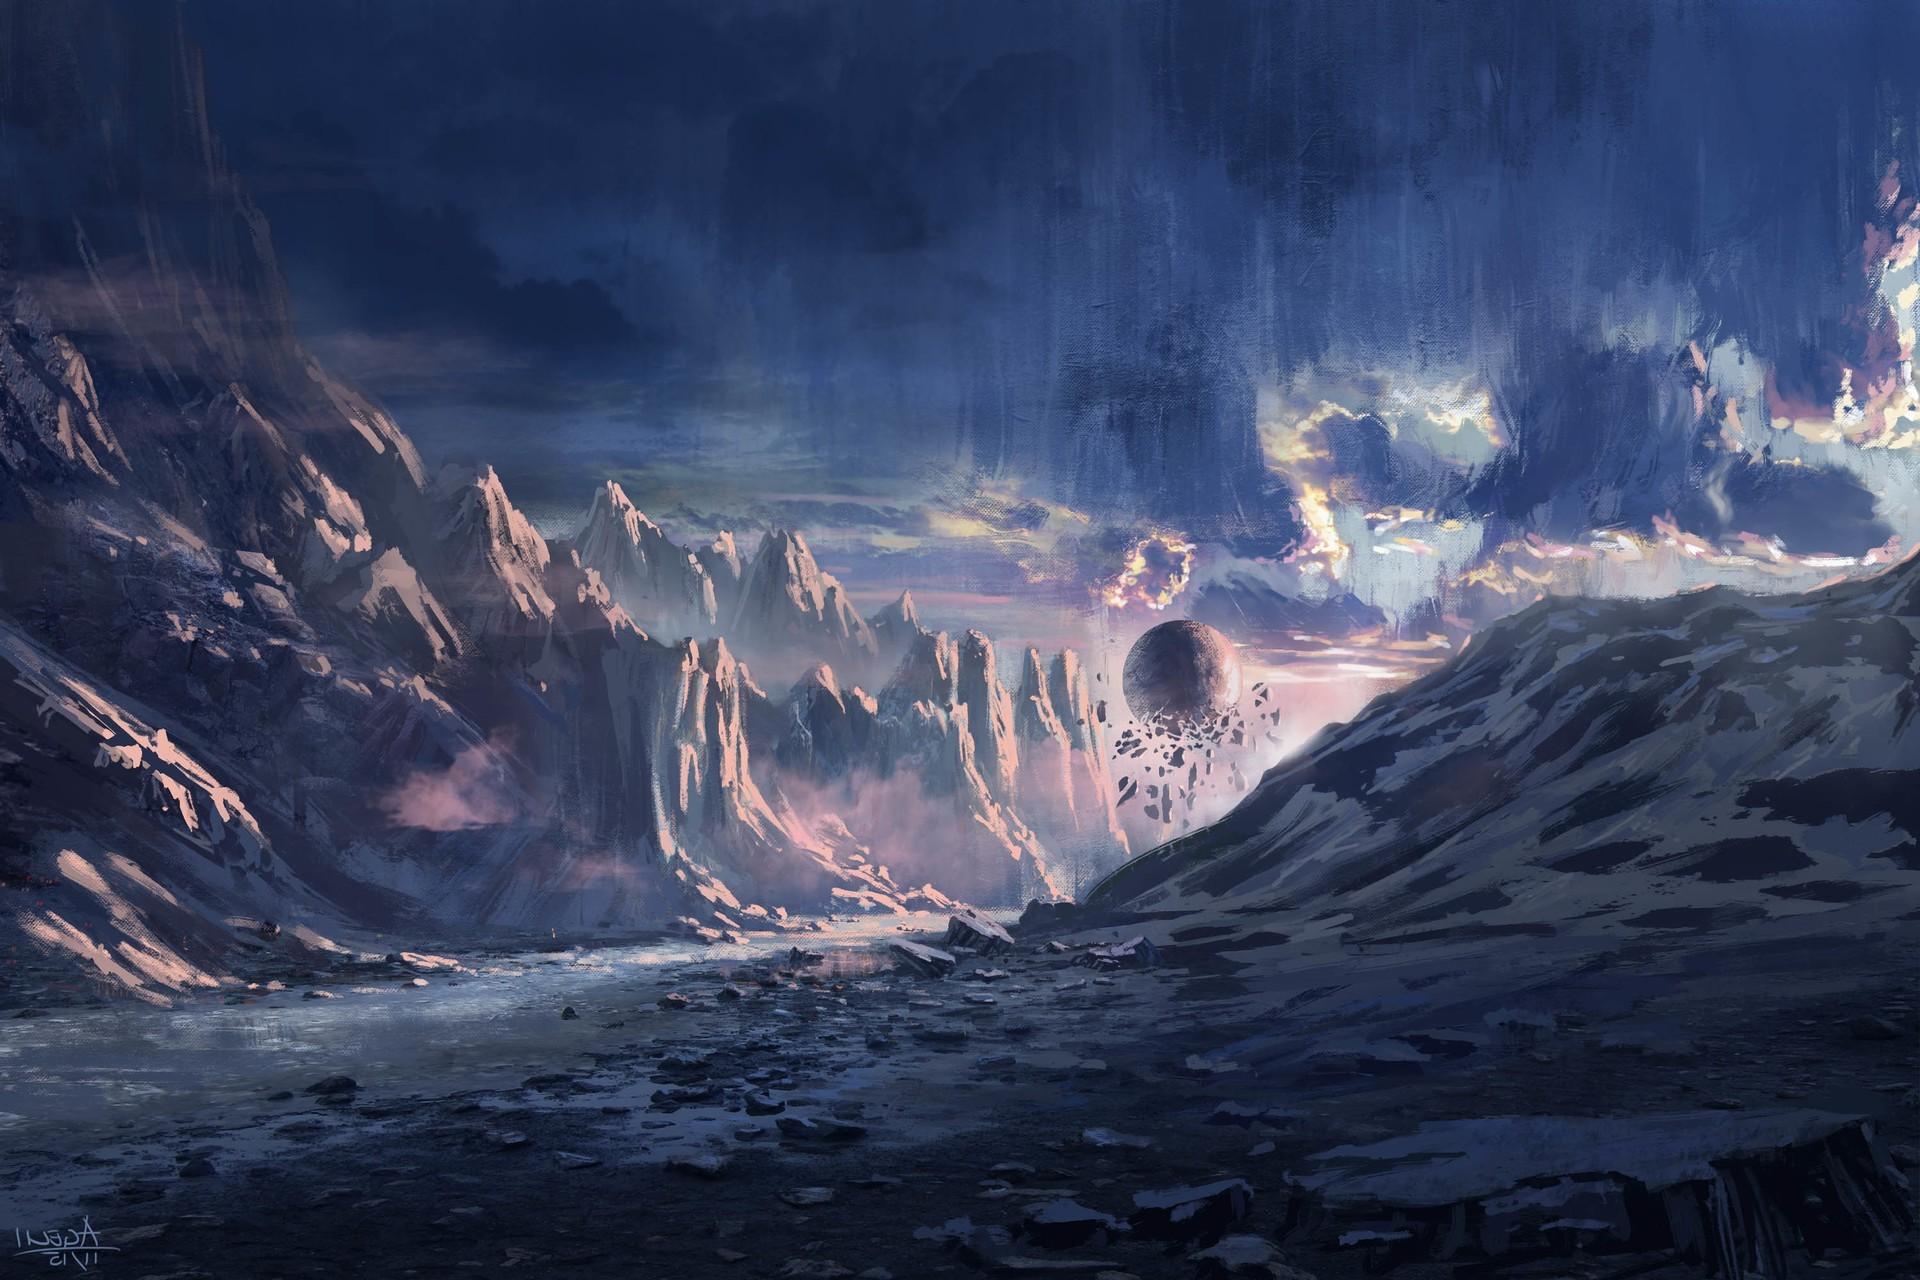 Beautiful Wallpaper Mountain Art - 1920x1280-px-artwork-digital-art-fantasy-art-mountain-1025439  Image_142720.jpg